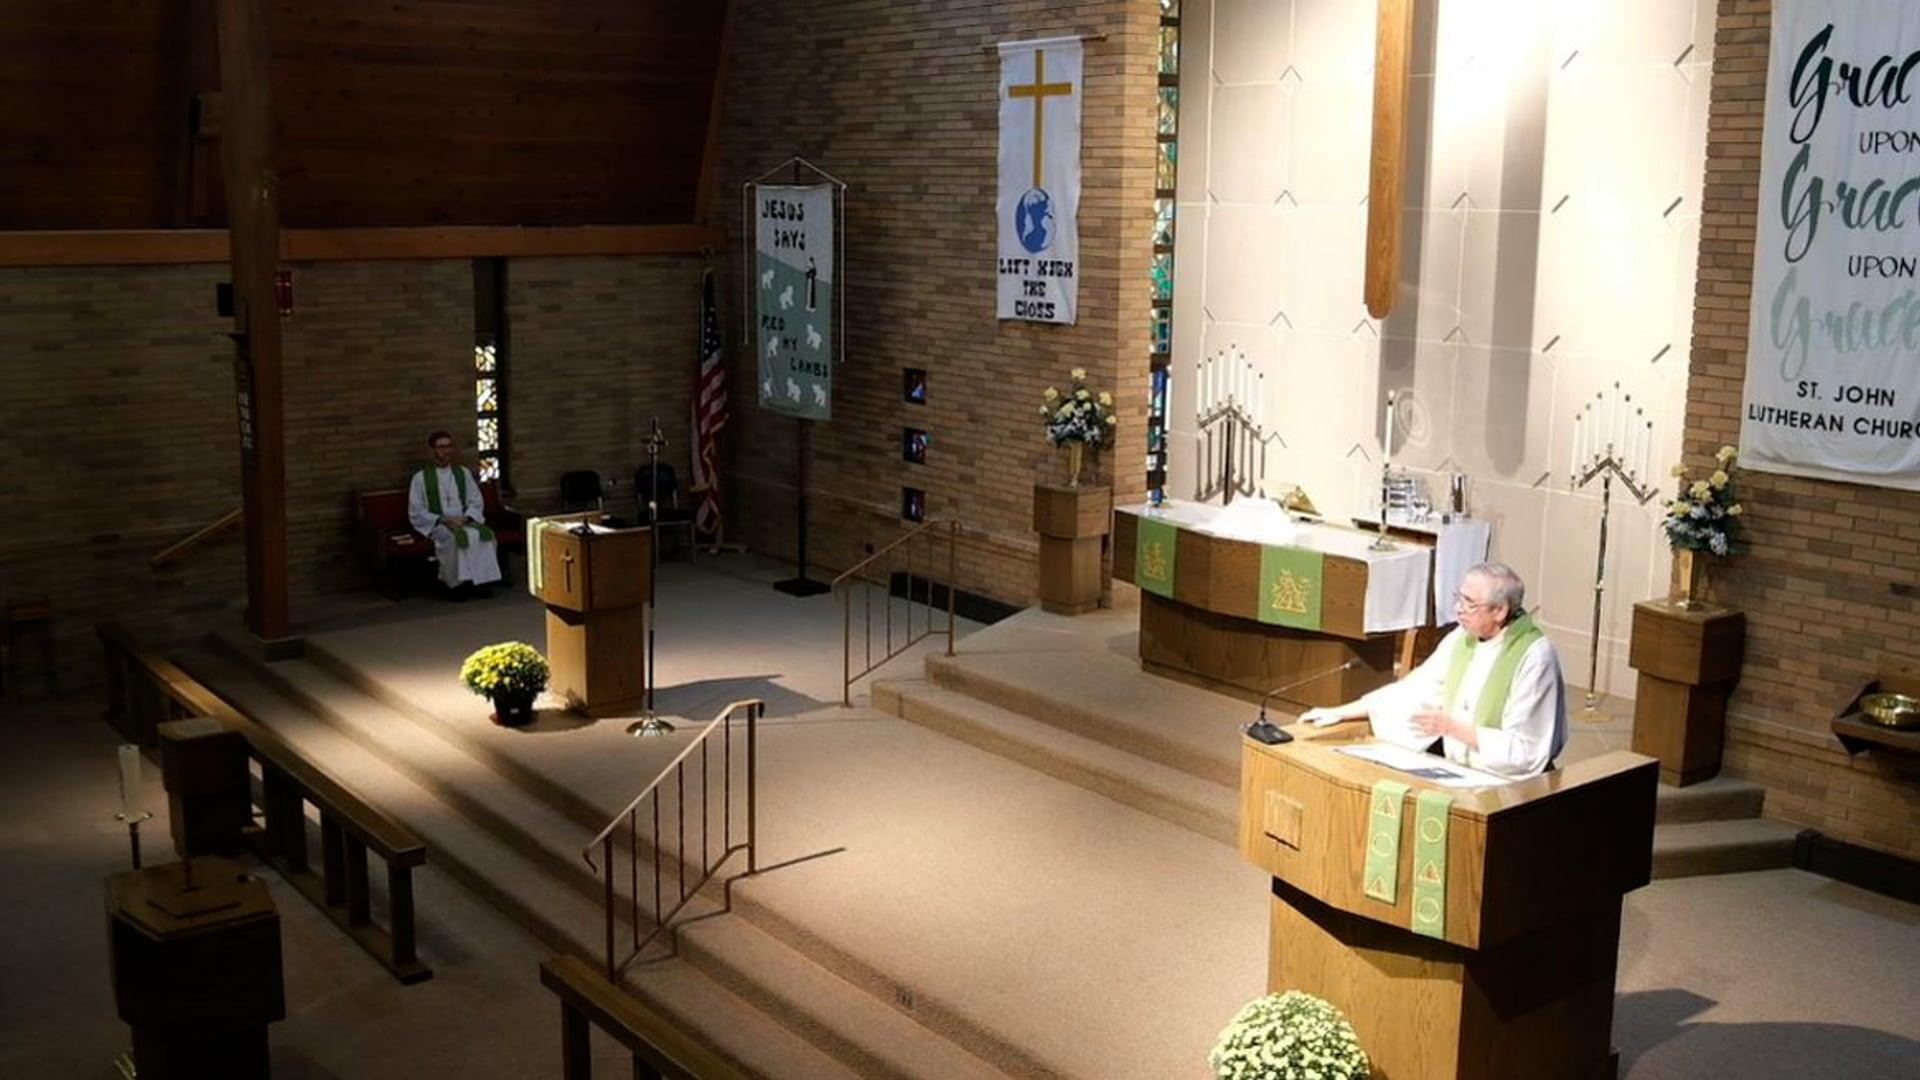 Divine Service, 18th Sunday after Pentecost